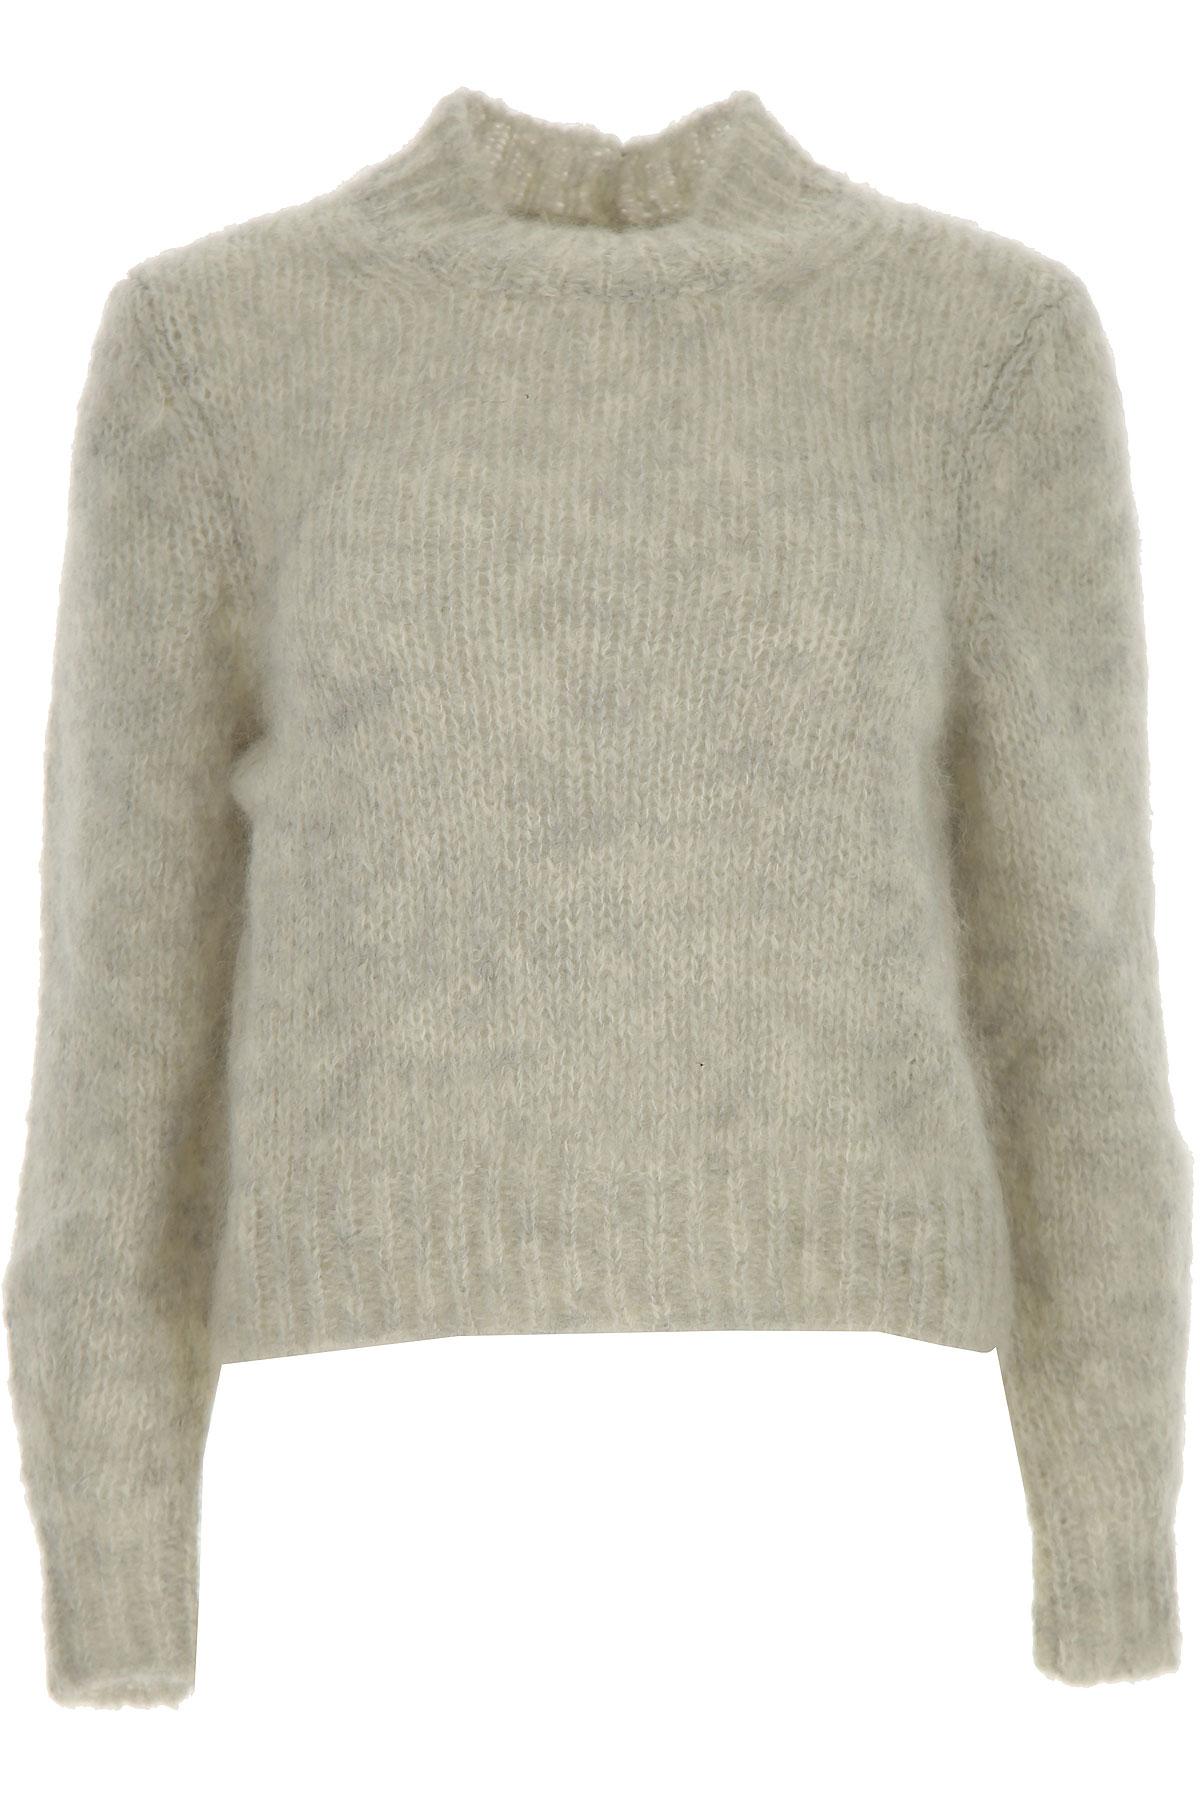 Isabel Marant Sweater for Women Jumper, Light Grey, Super Kid mohair, 2019, 4 6